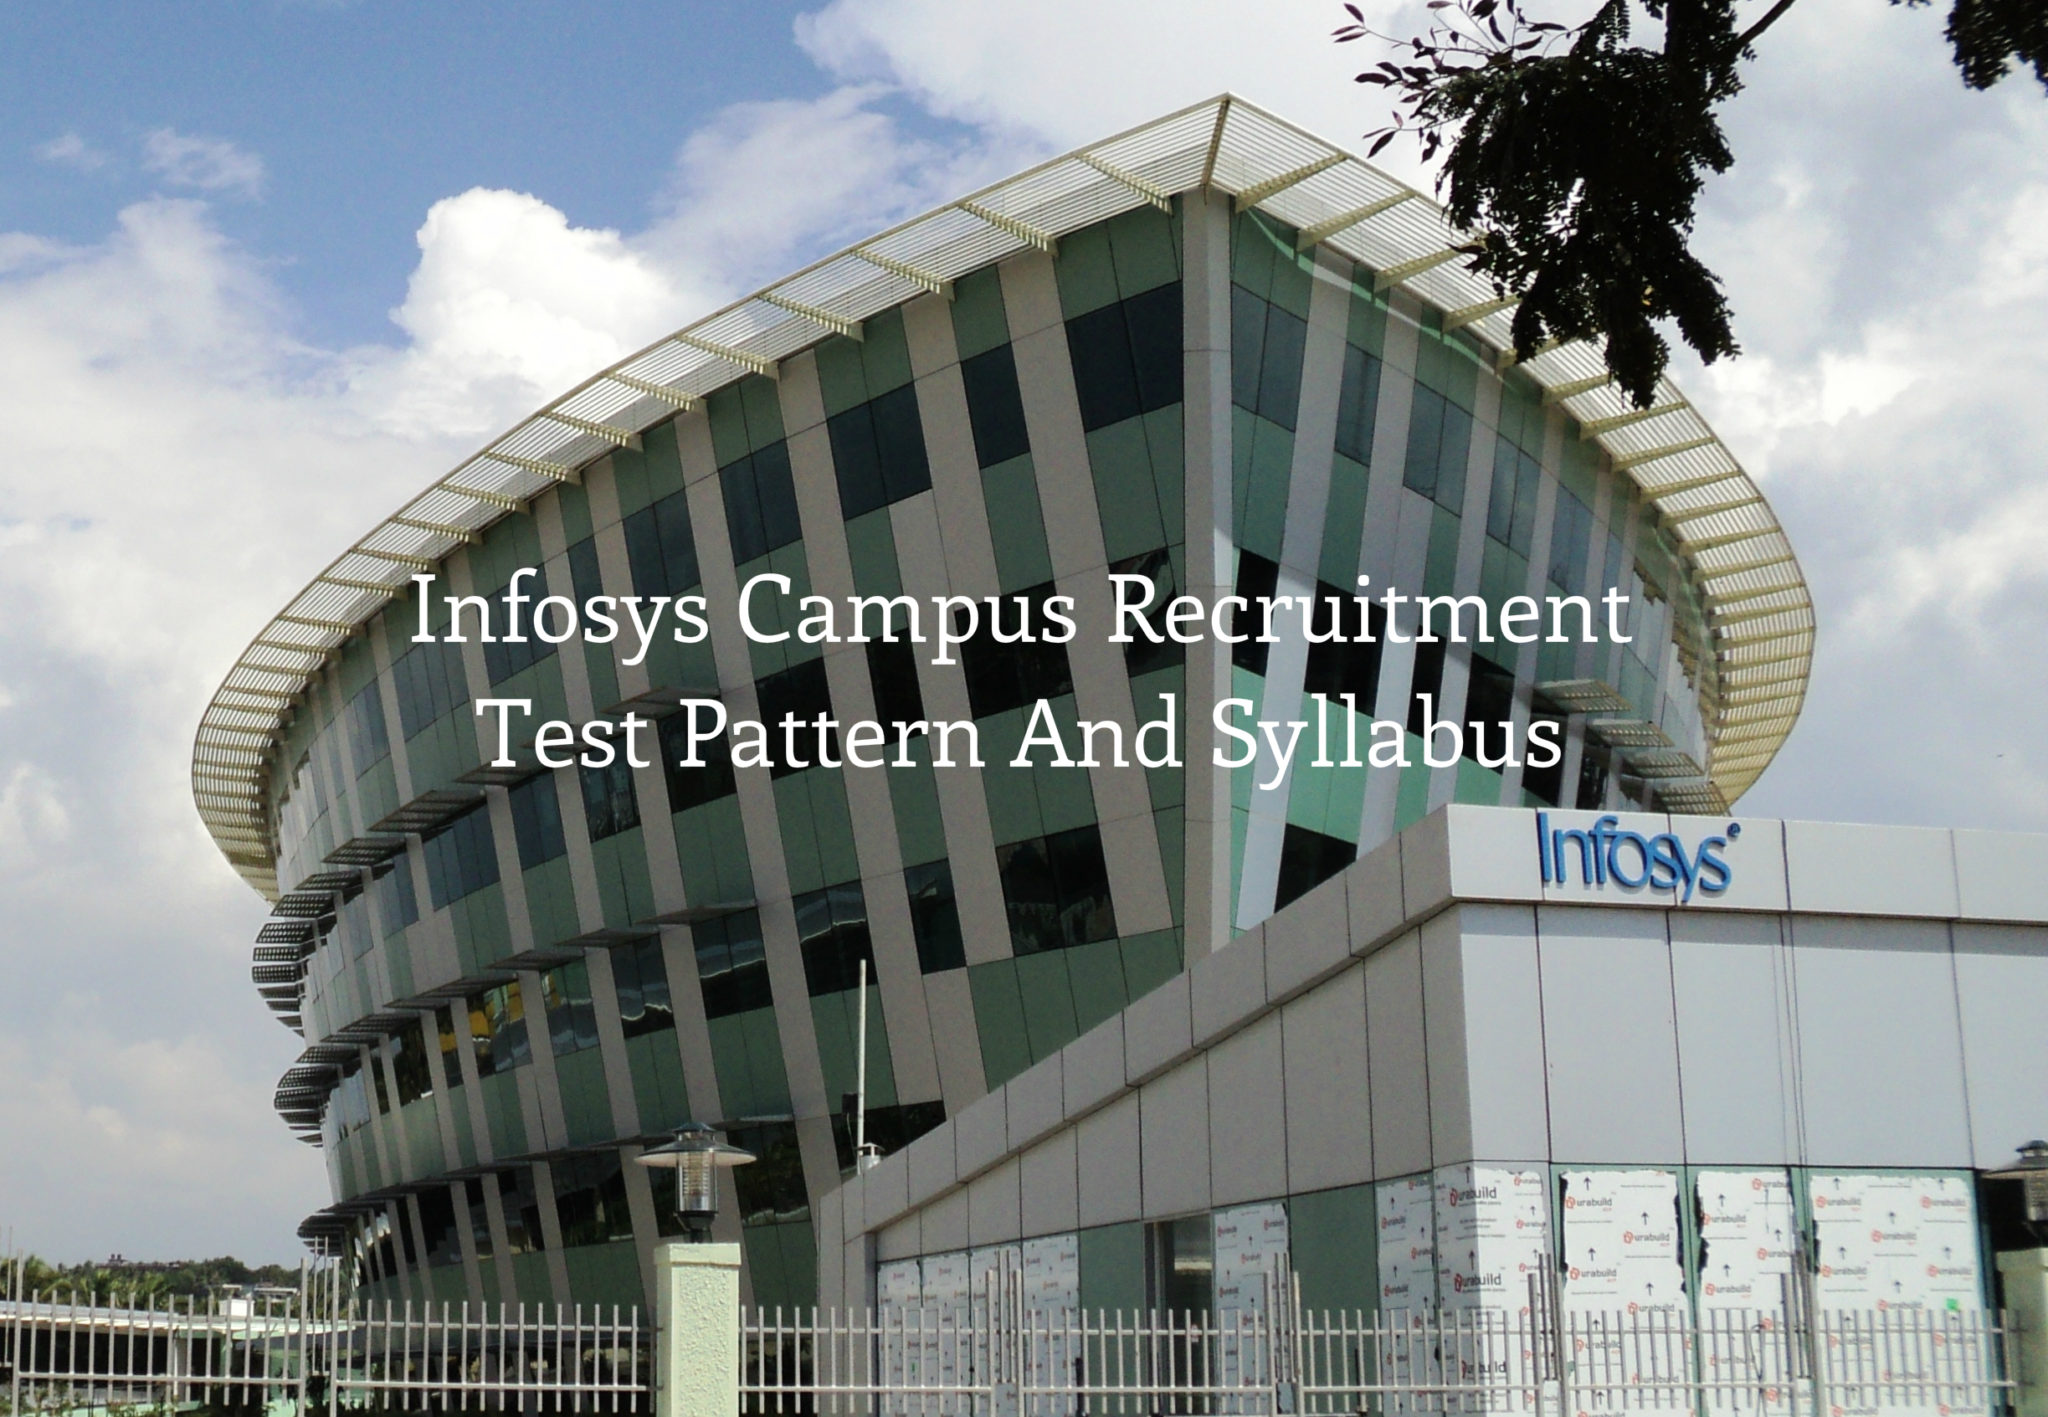 Infosys Campus Recruitment